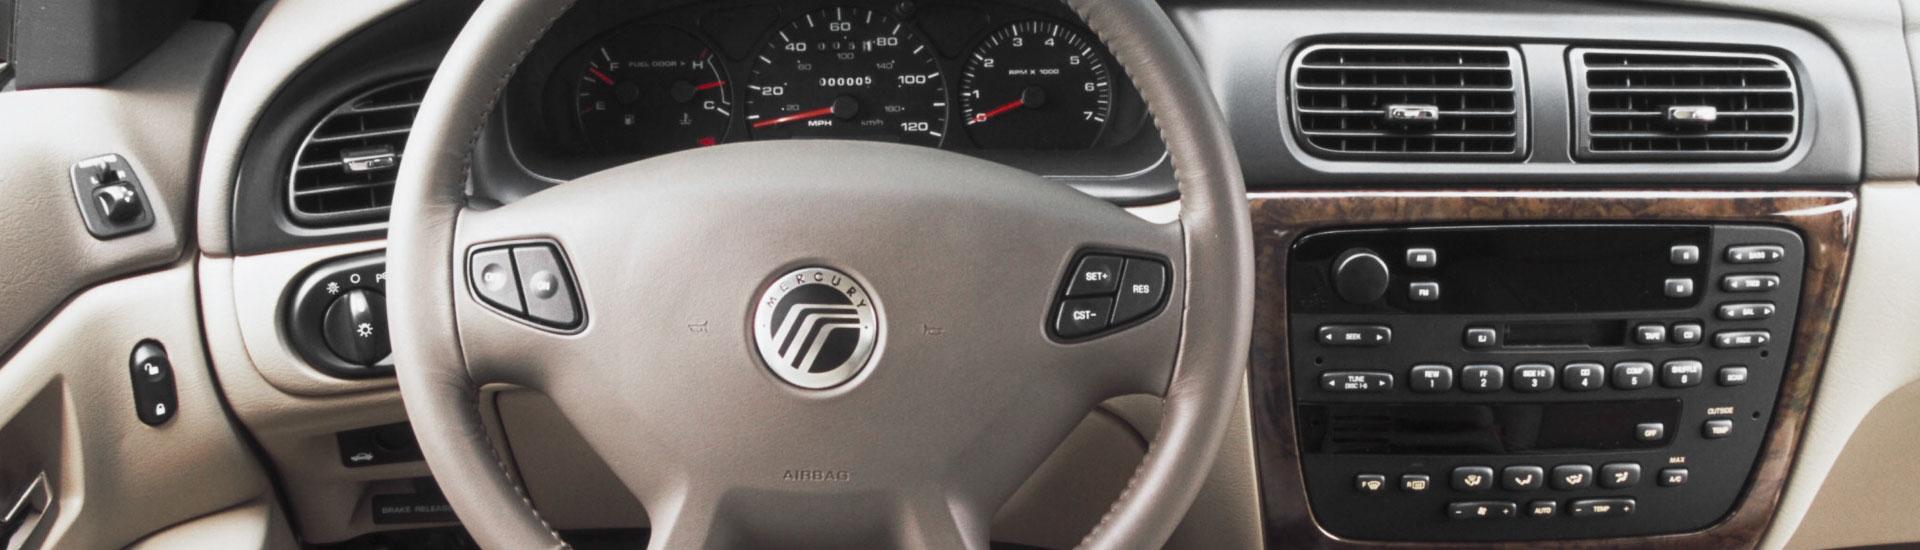 67 Camaro Rs Headlight Wiring Free Download Wiring Diagram Schematic